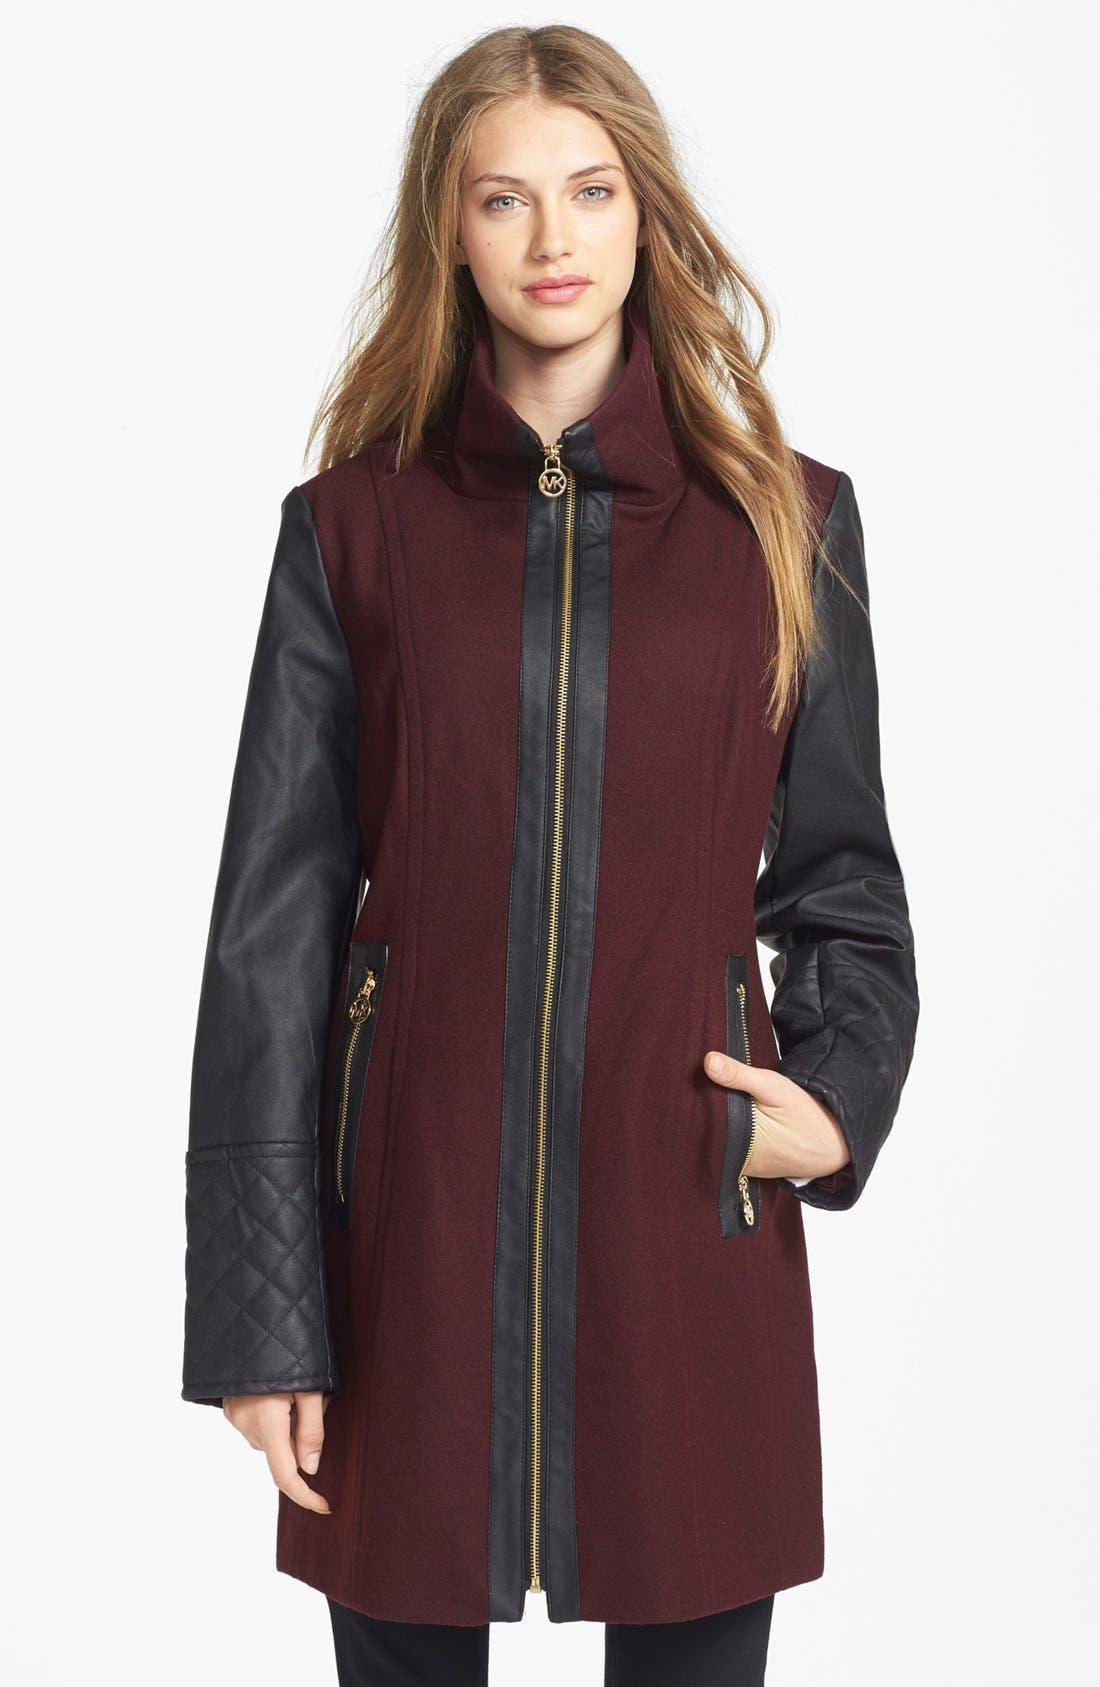 Alternate Image 1 Selected - MICHAEL Michael Kors Faux Leather Sleeve Wool Blend Coat